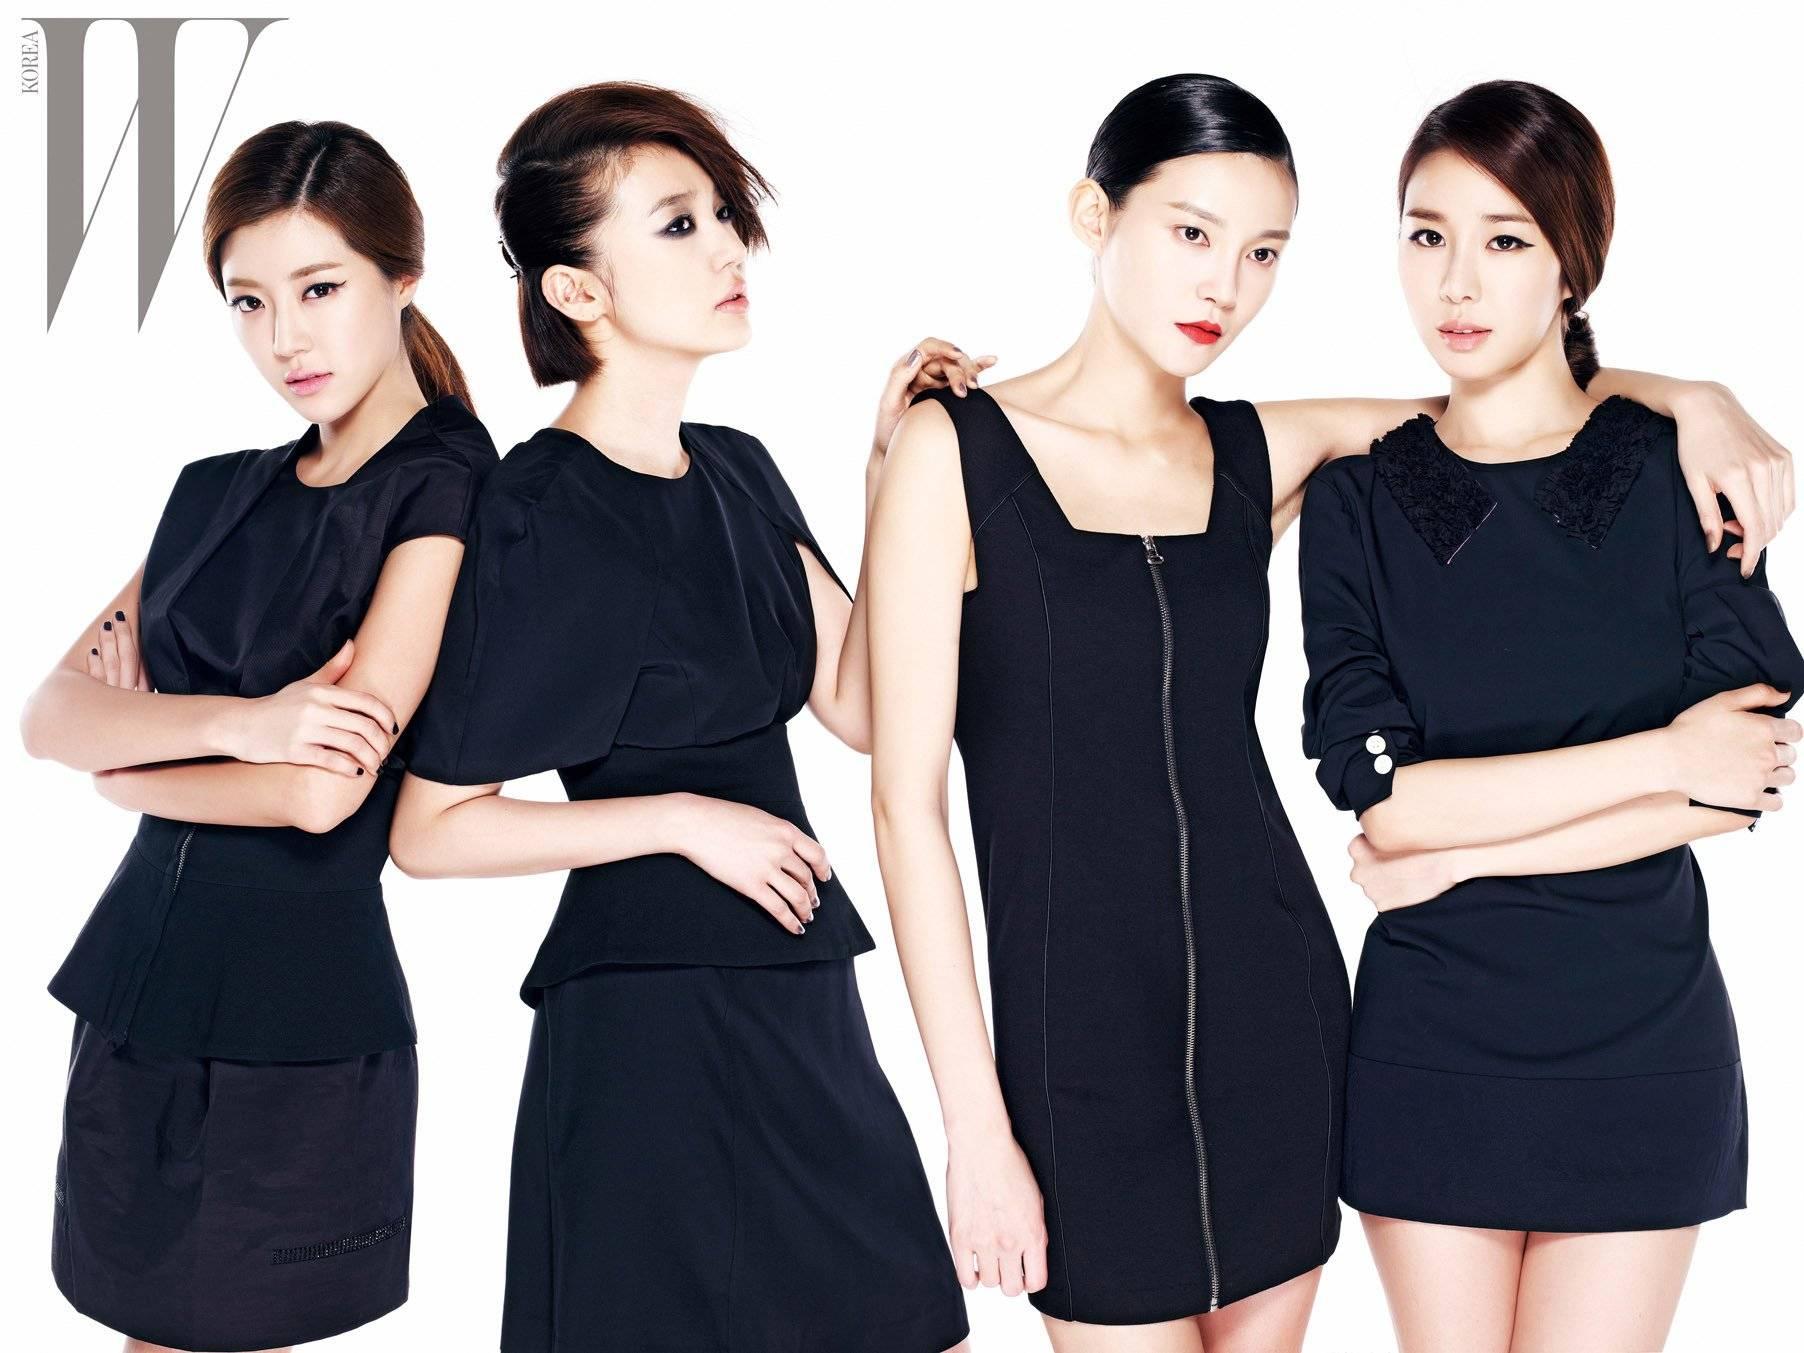 Black dress korean - The Black Mini Dress Korean Movie